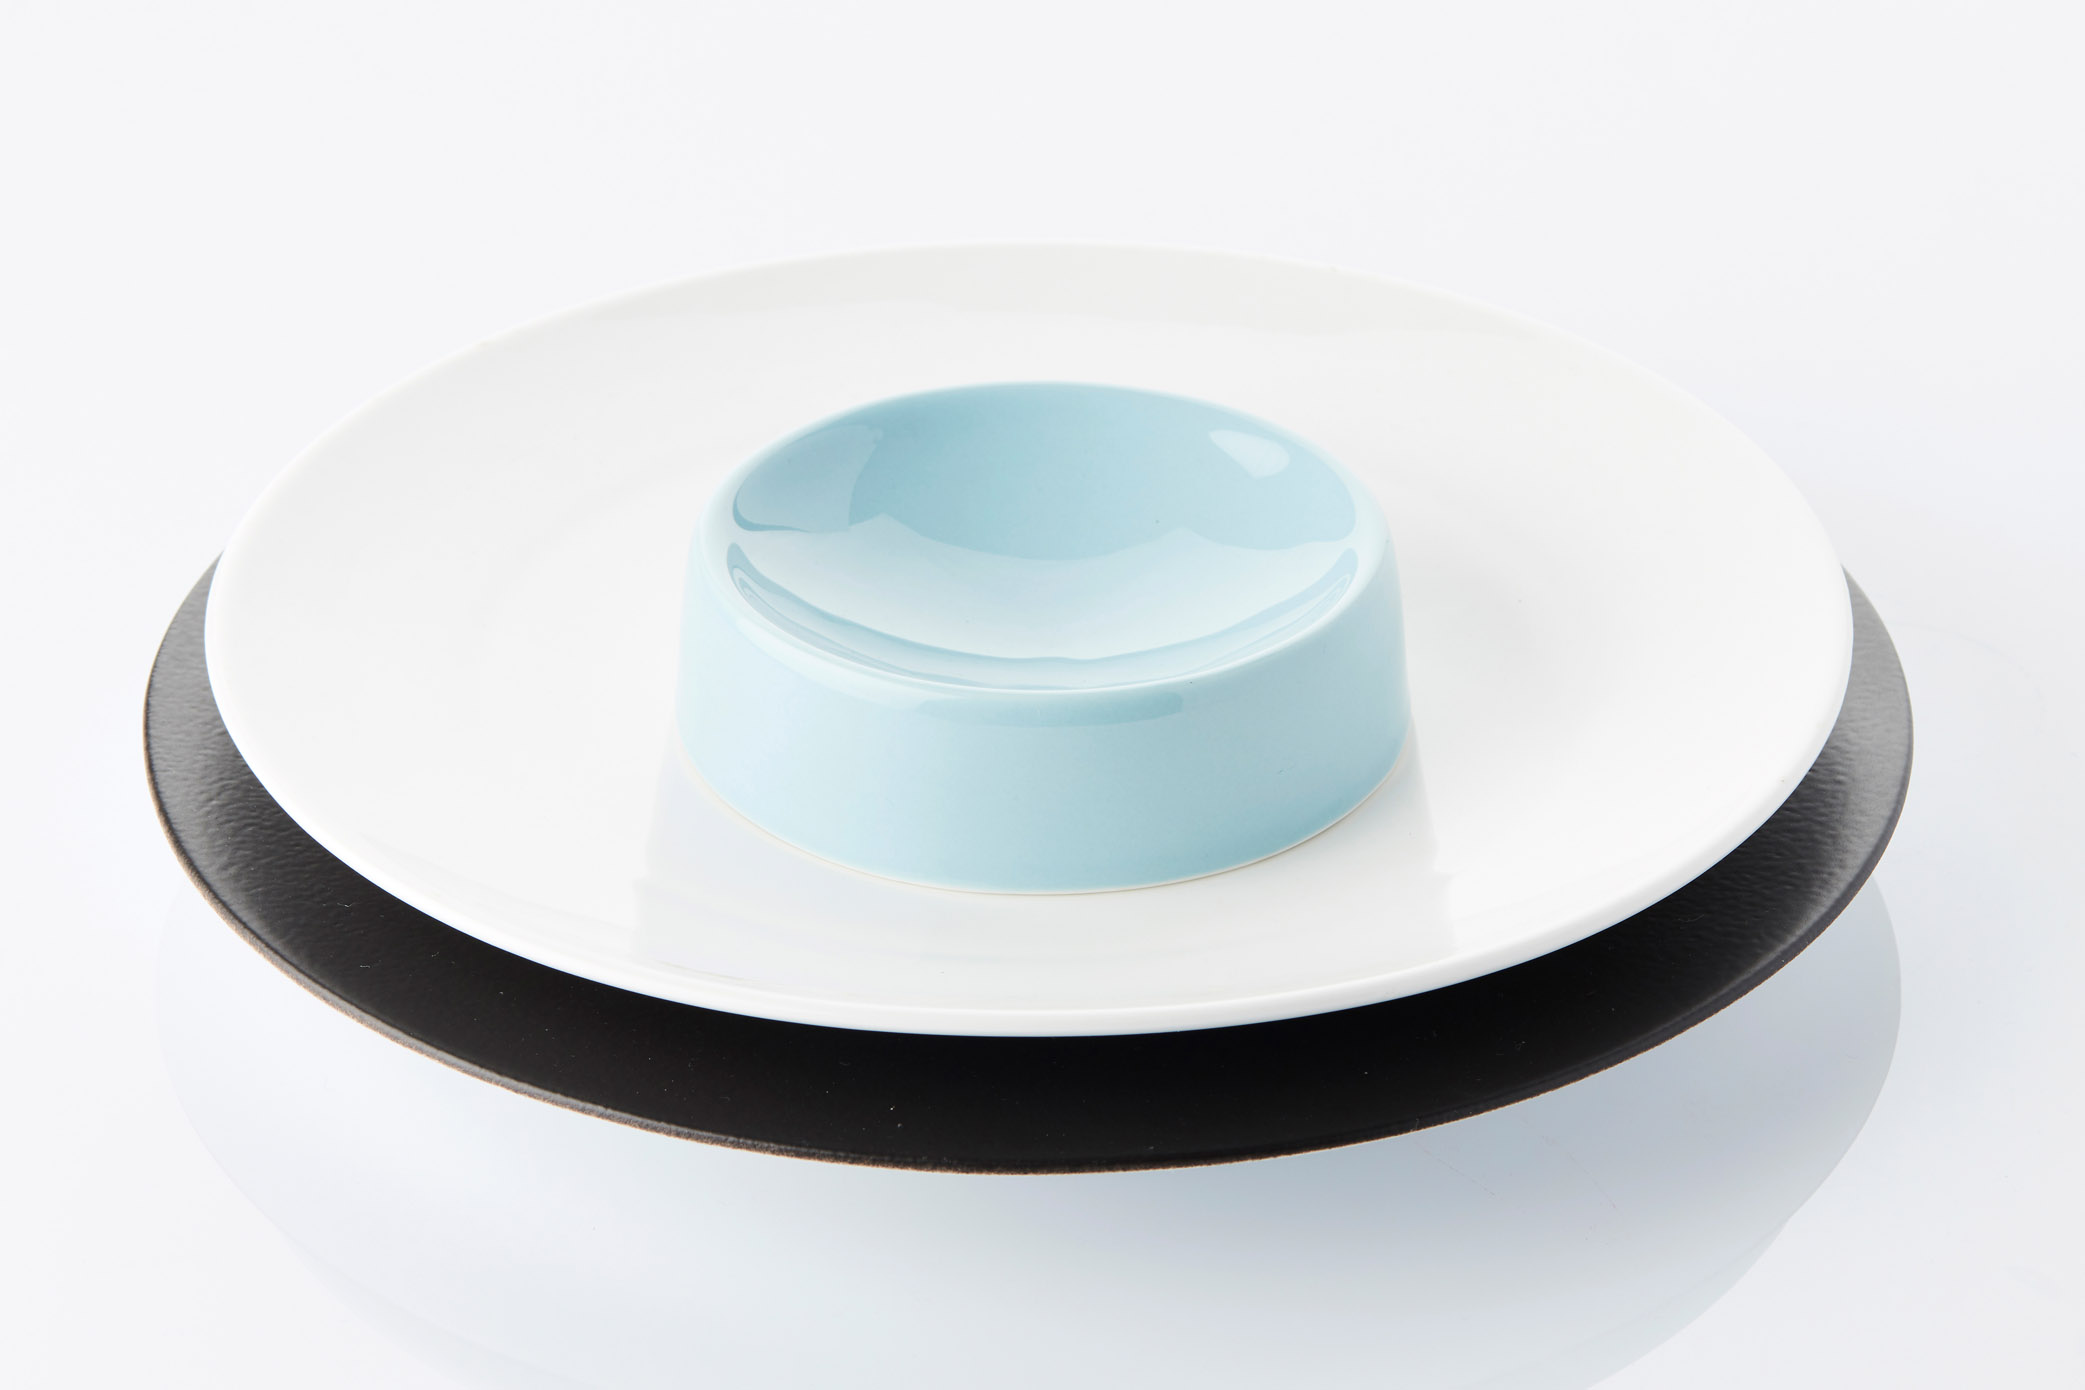 Uitgelezene Nieuw: S.Pellegrino Tableware   Hungry for More CO-36